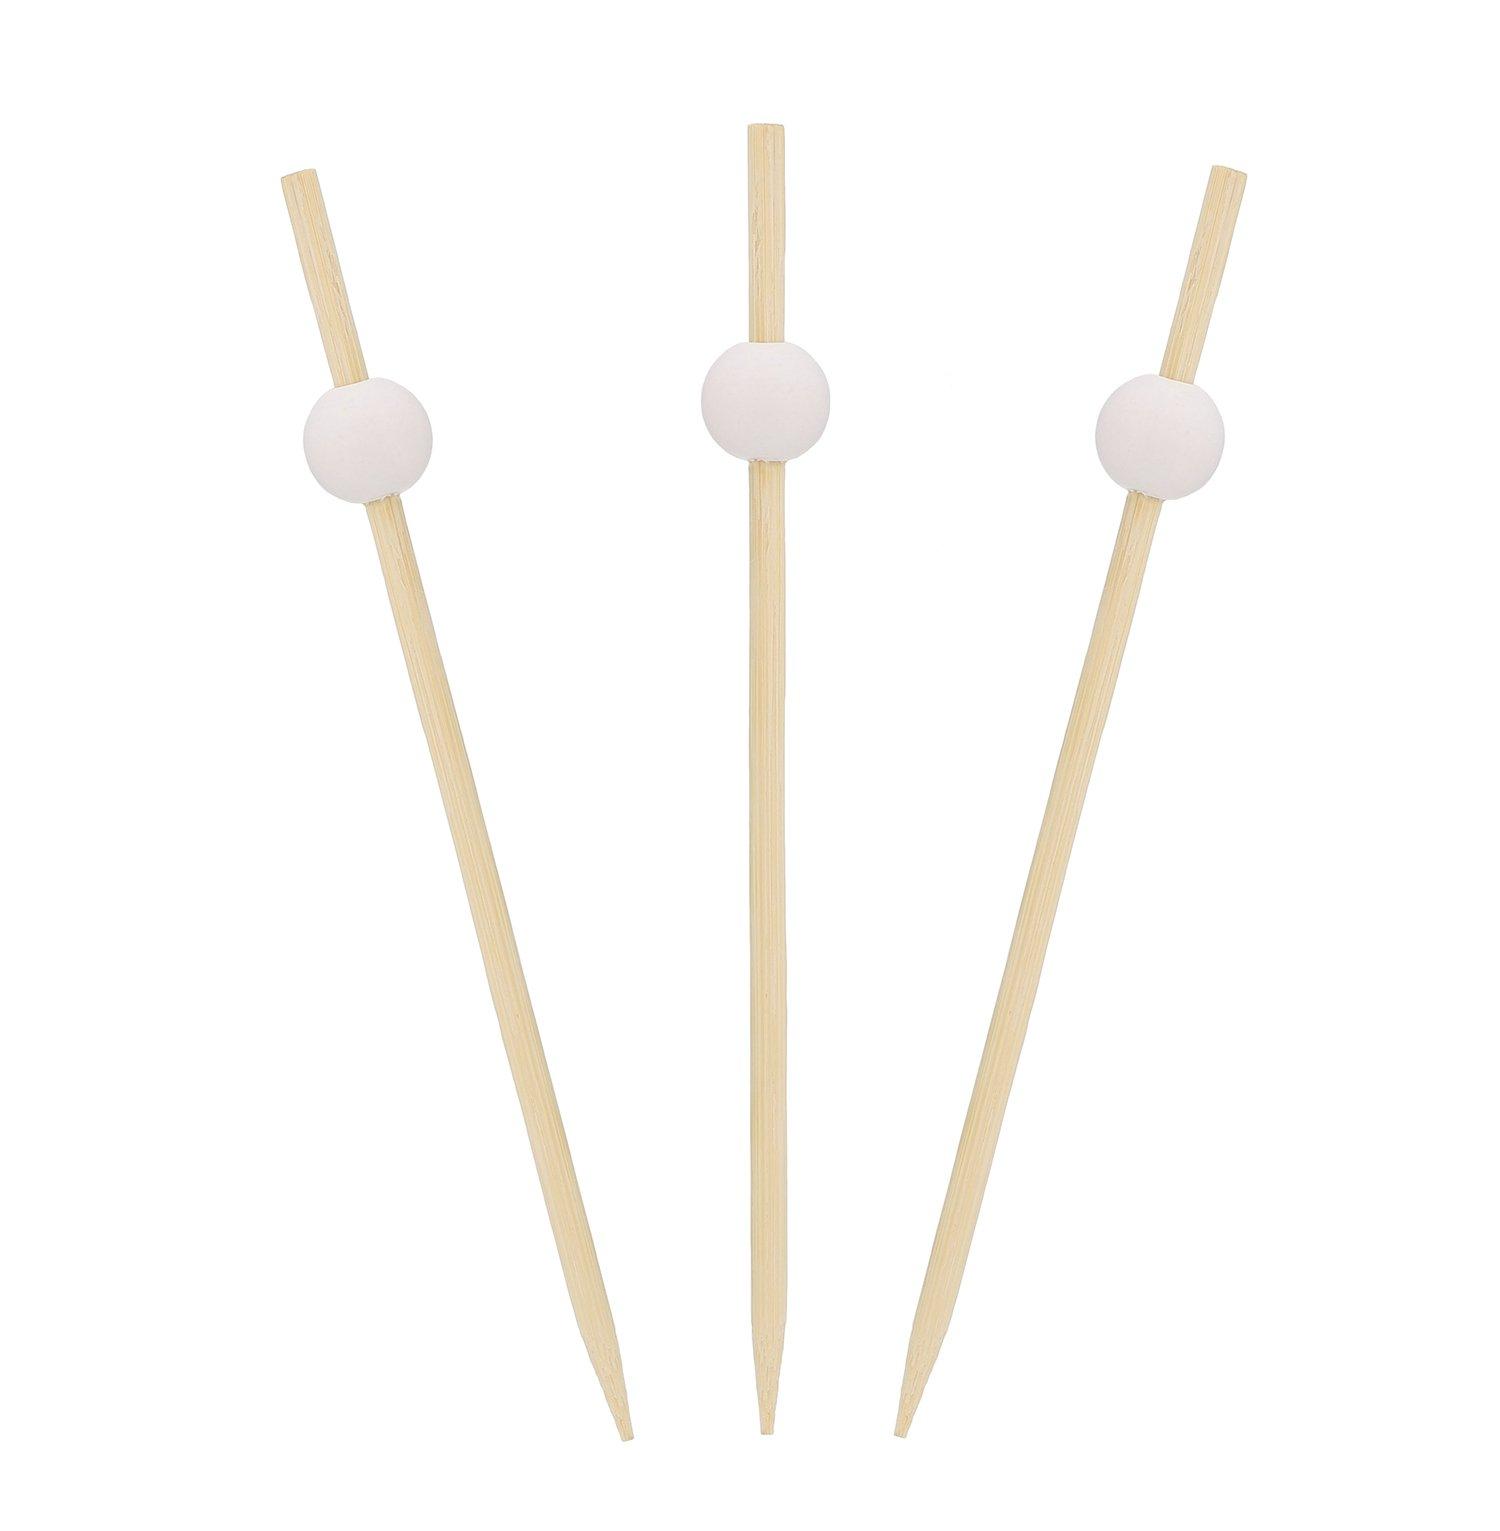 Royal 4.75'' White Bamboo Ball Picks, Package of 100